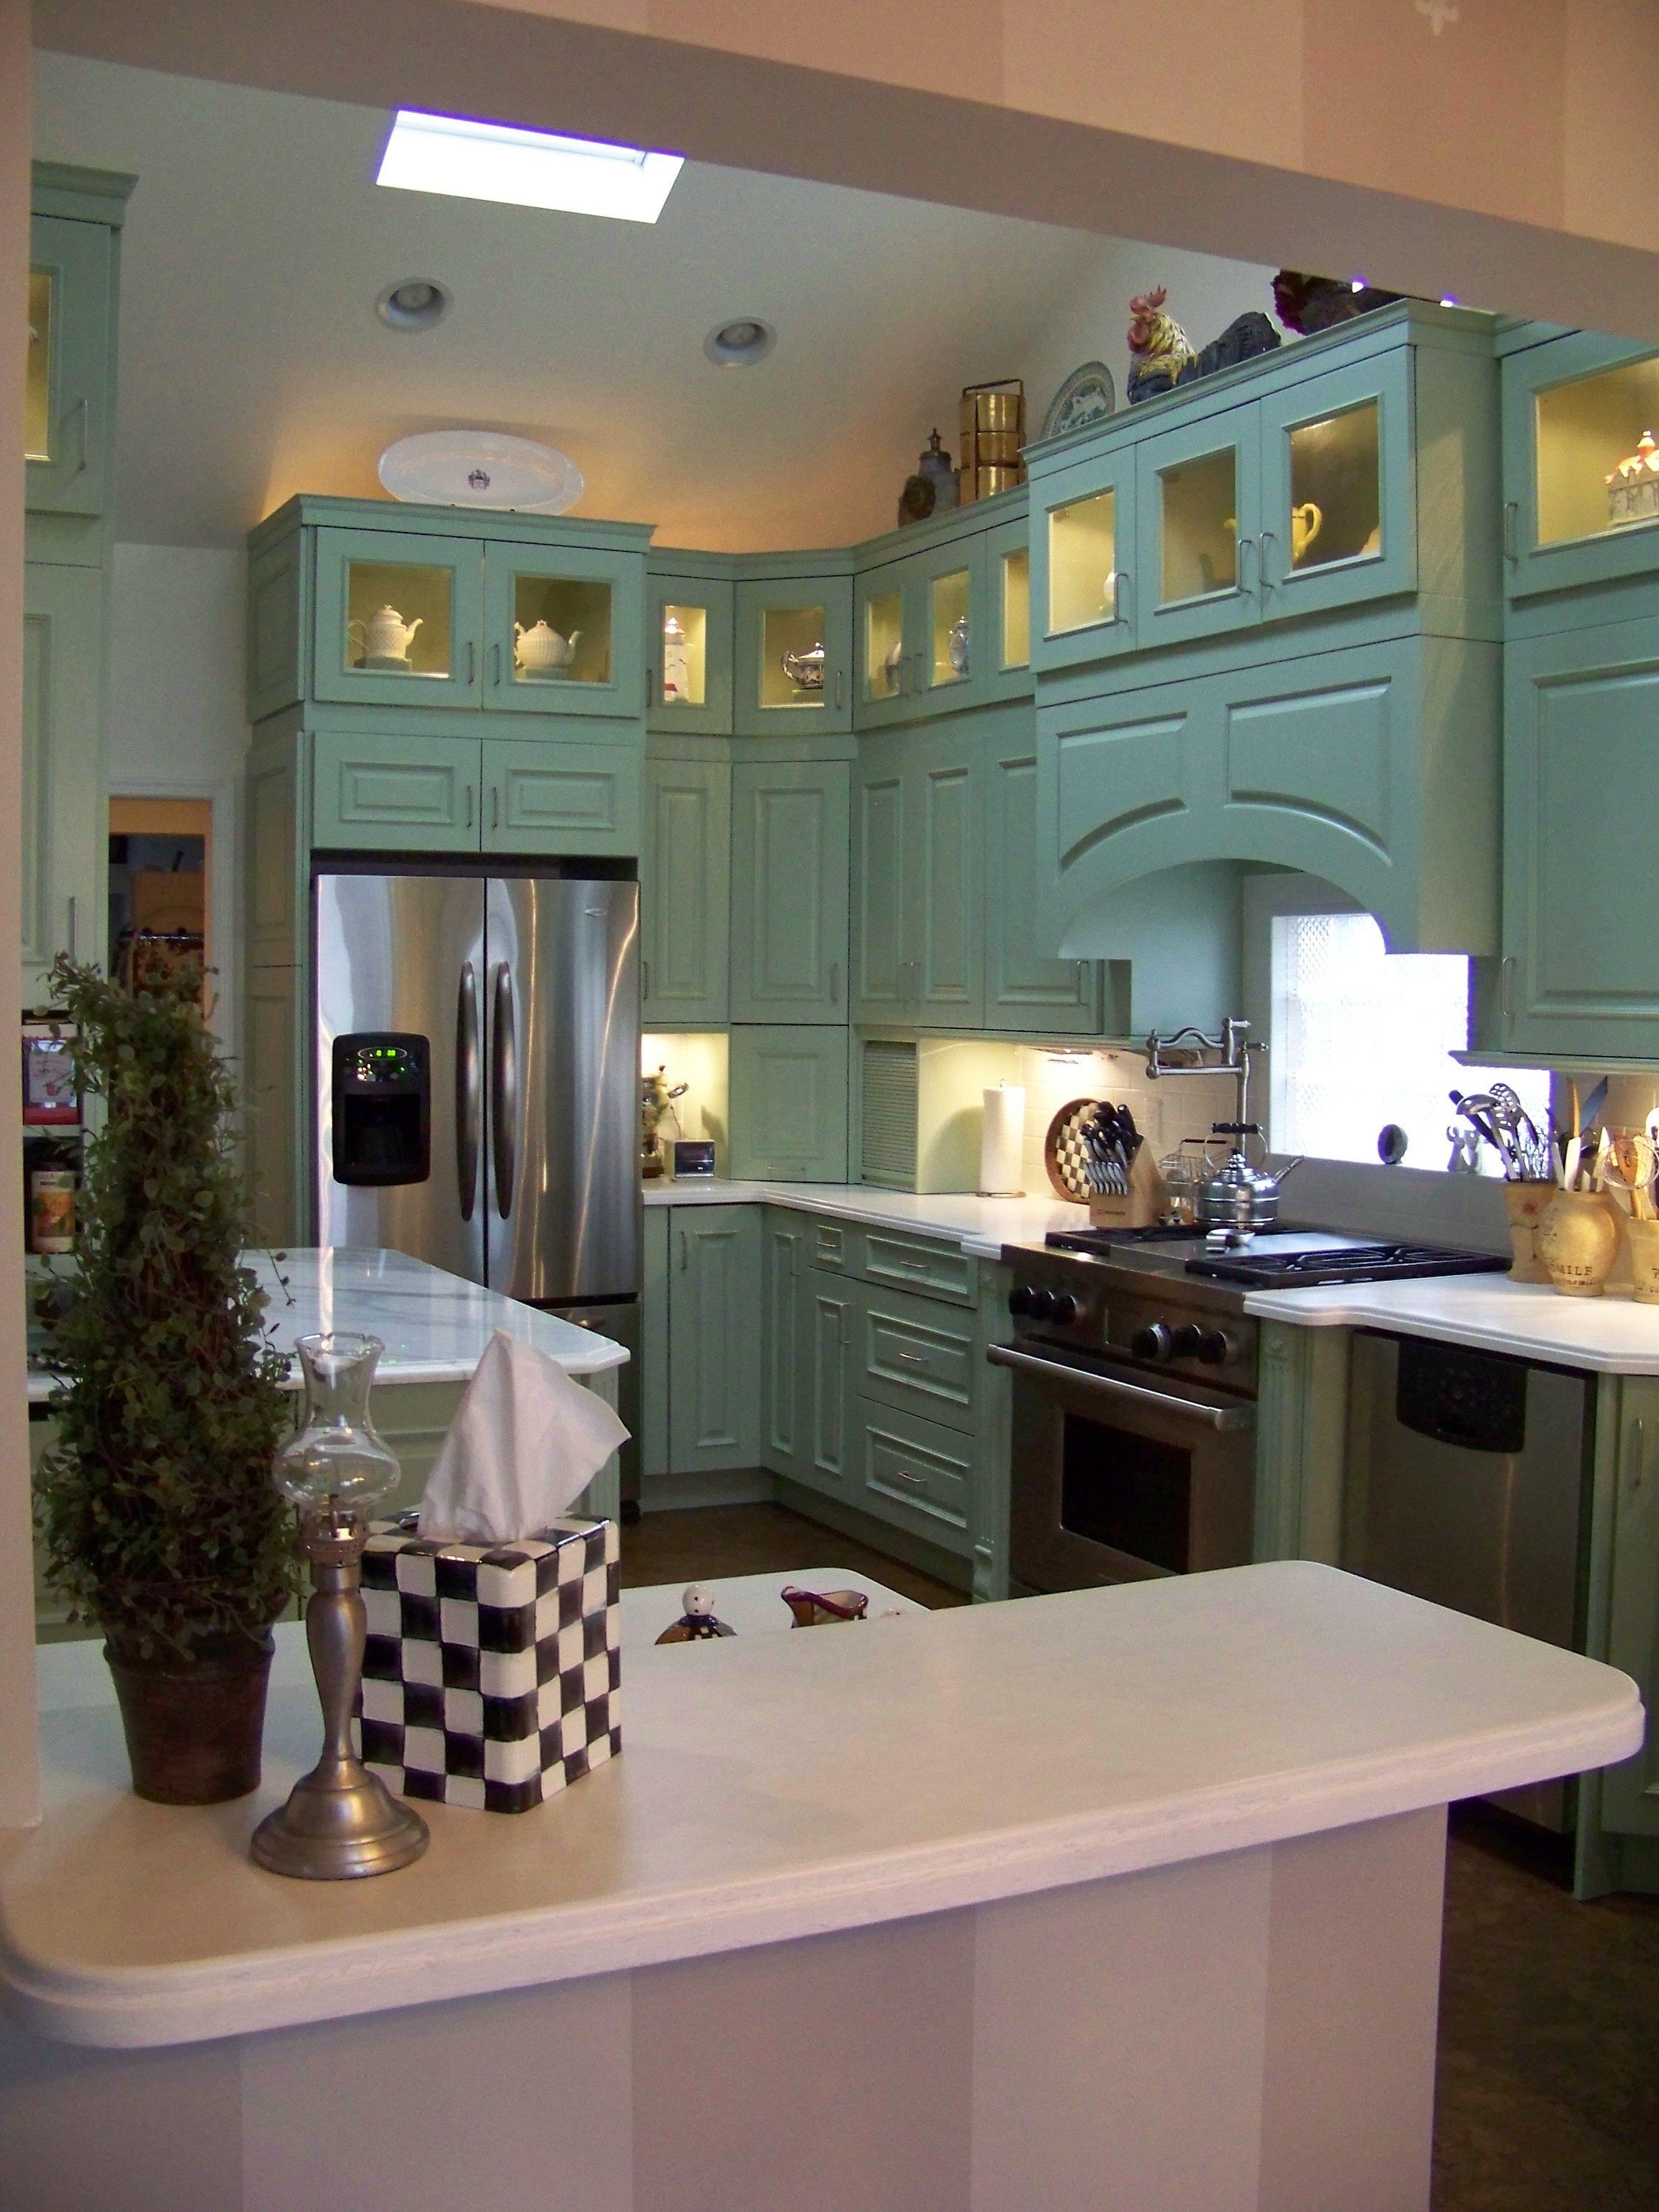 Major kitchen remodel Major kitchen remodel